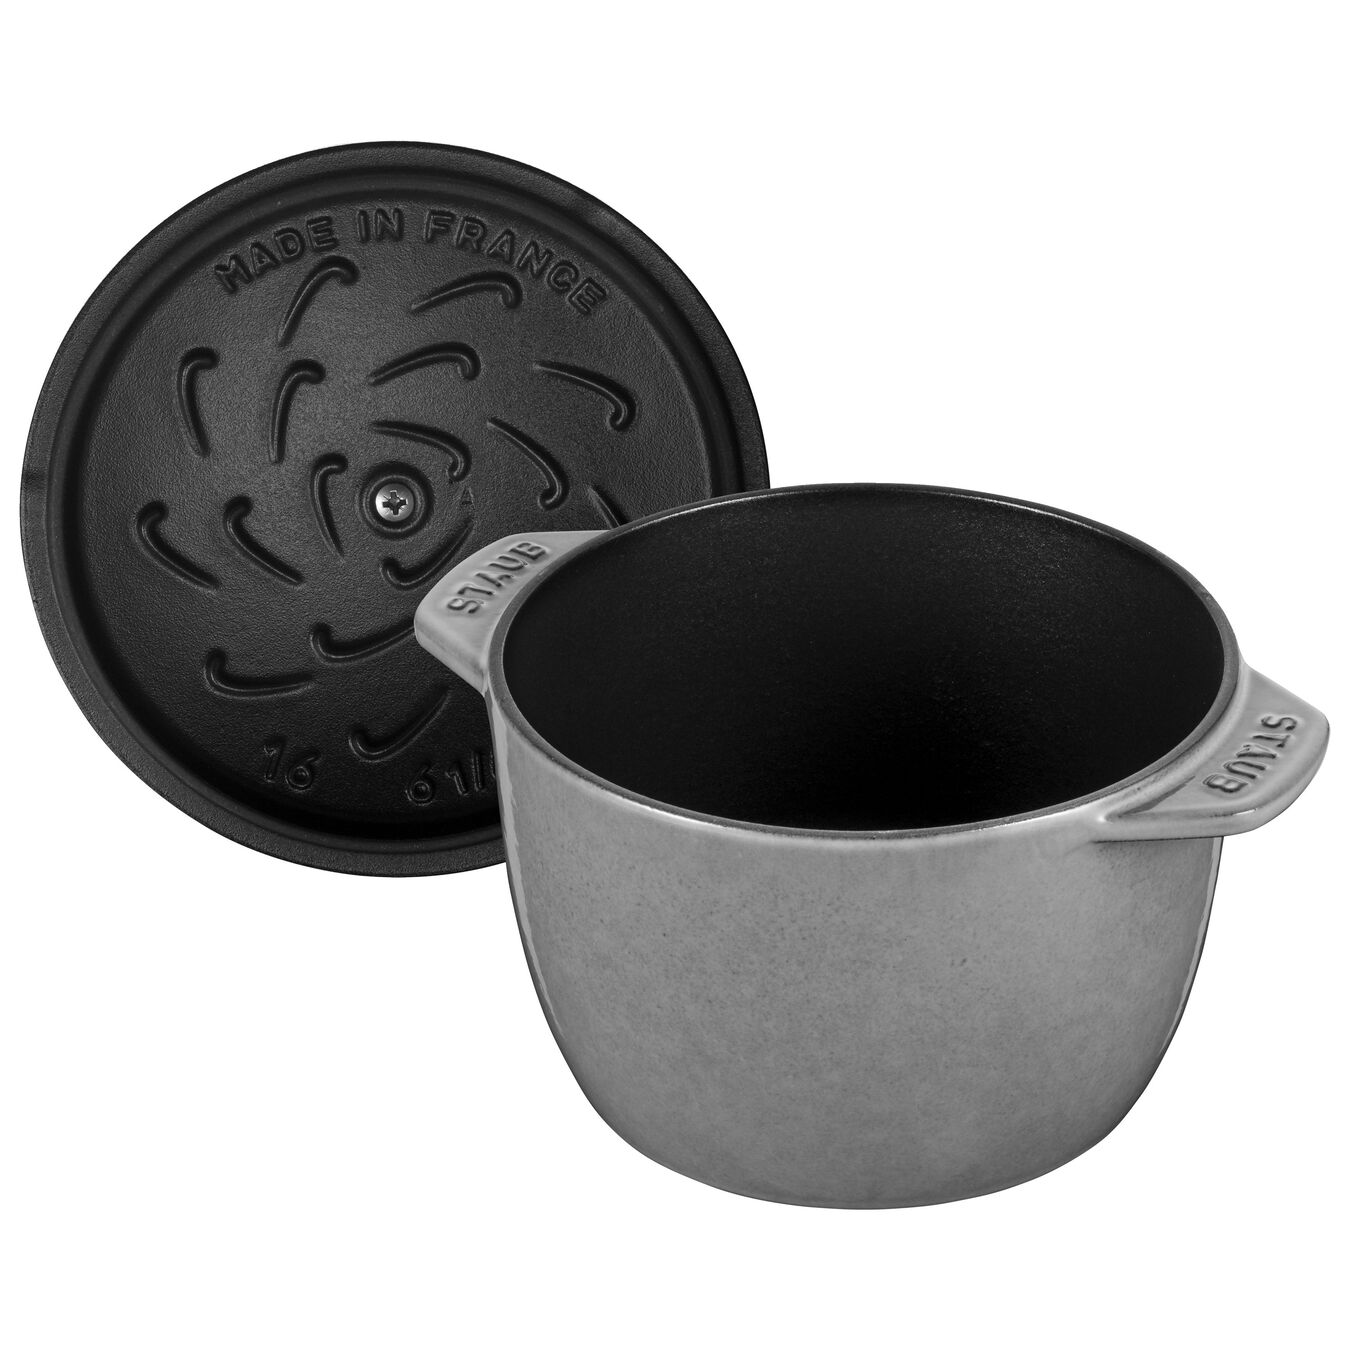 Reis-Cocotte 16 cm, rund, Graphit-Grau, Gusseisen,,large 4